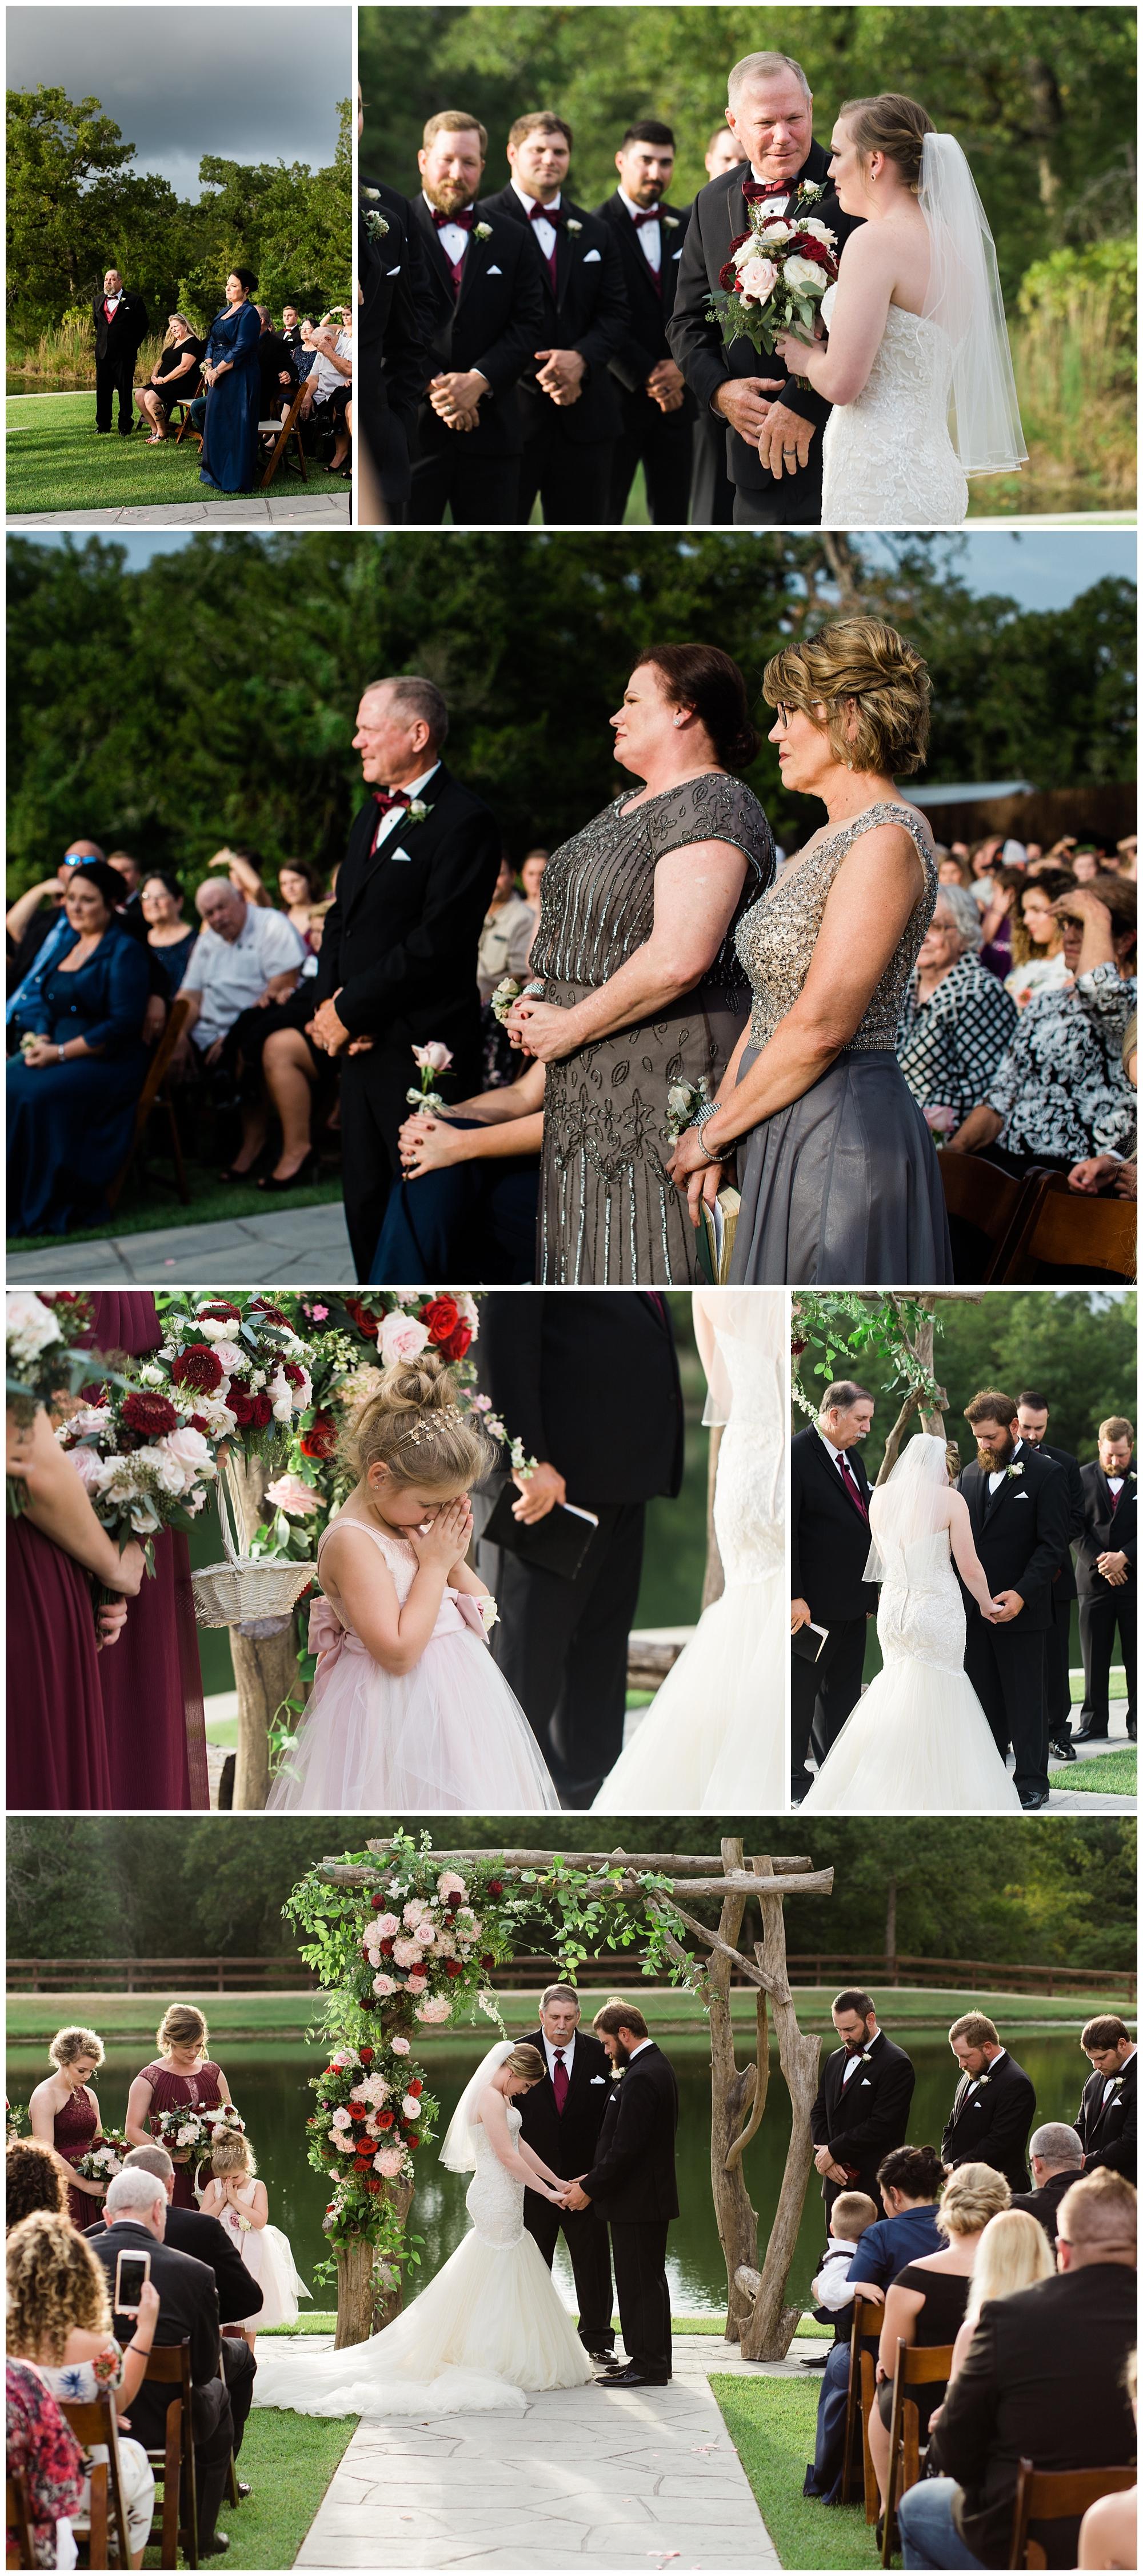 Peach_Creek_Ranch_Wedding_Kristina_Ross_Photography_0016.jpg